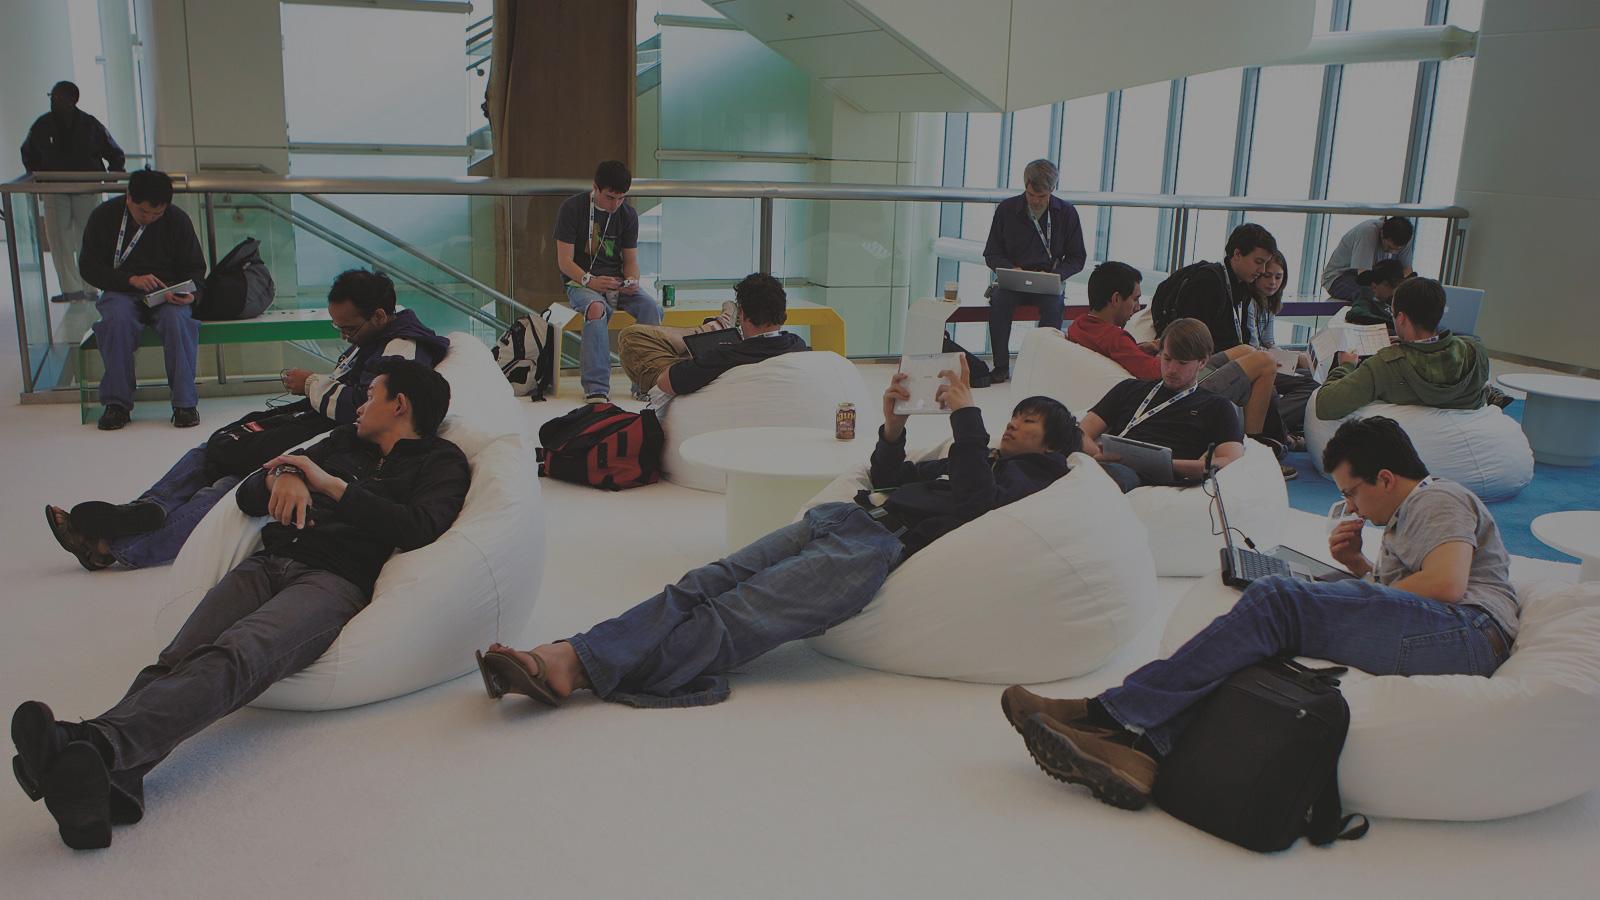 California Dreaming Corporate Culture In Silicon Valley